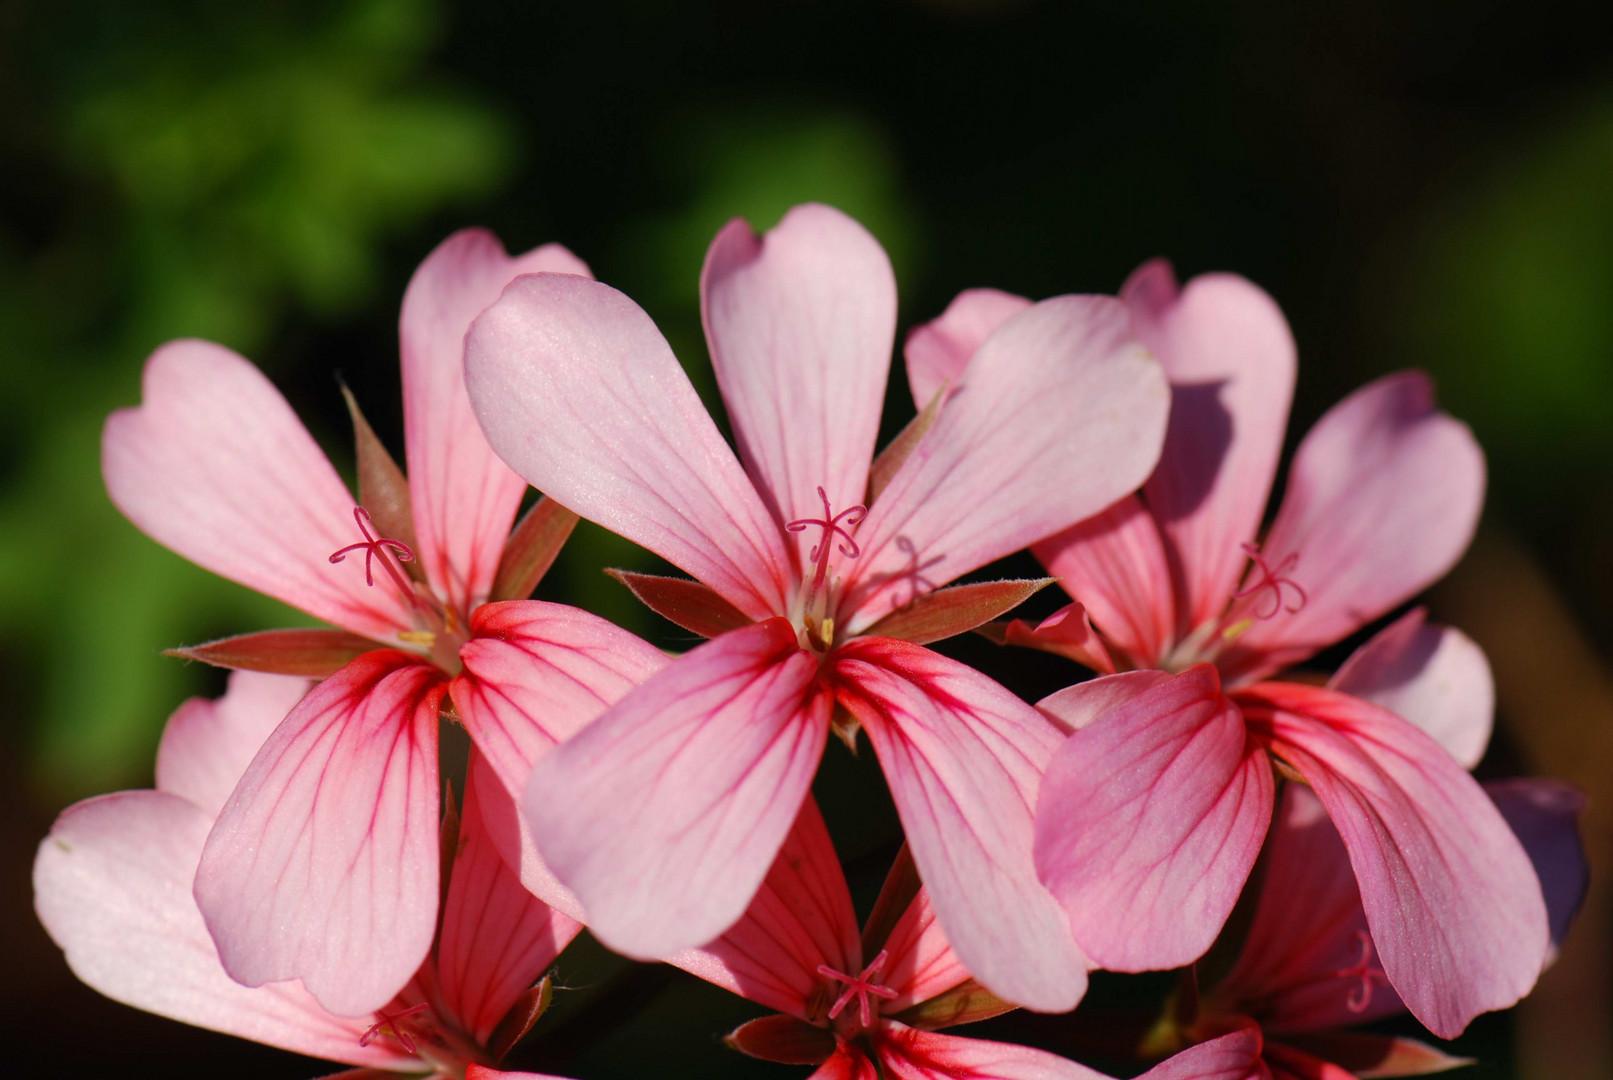 Rosa Bluhende Geranie Foto Bild Pflanzen Pilze Flechten